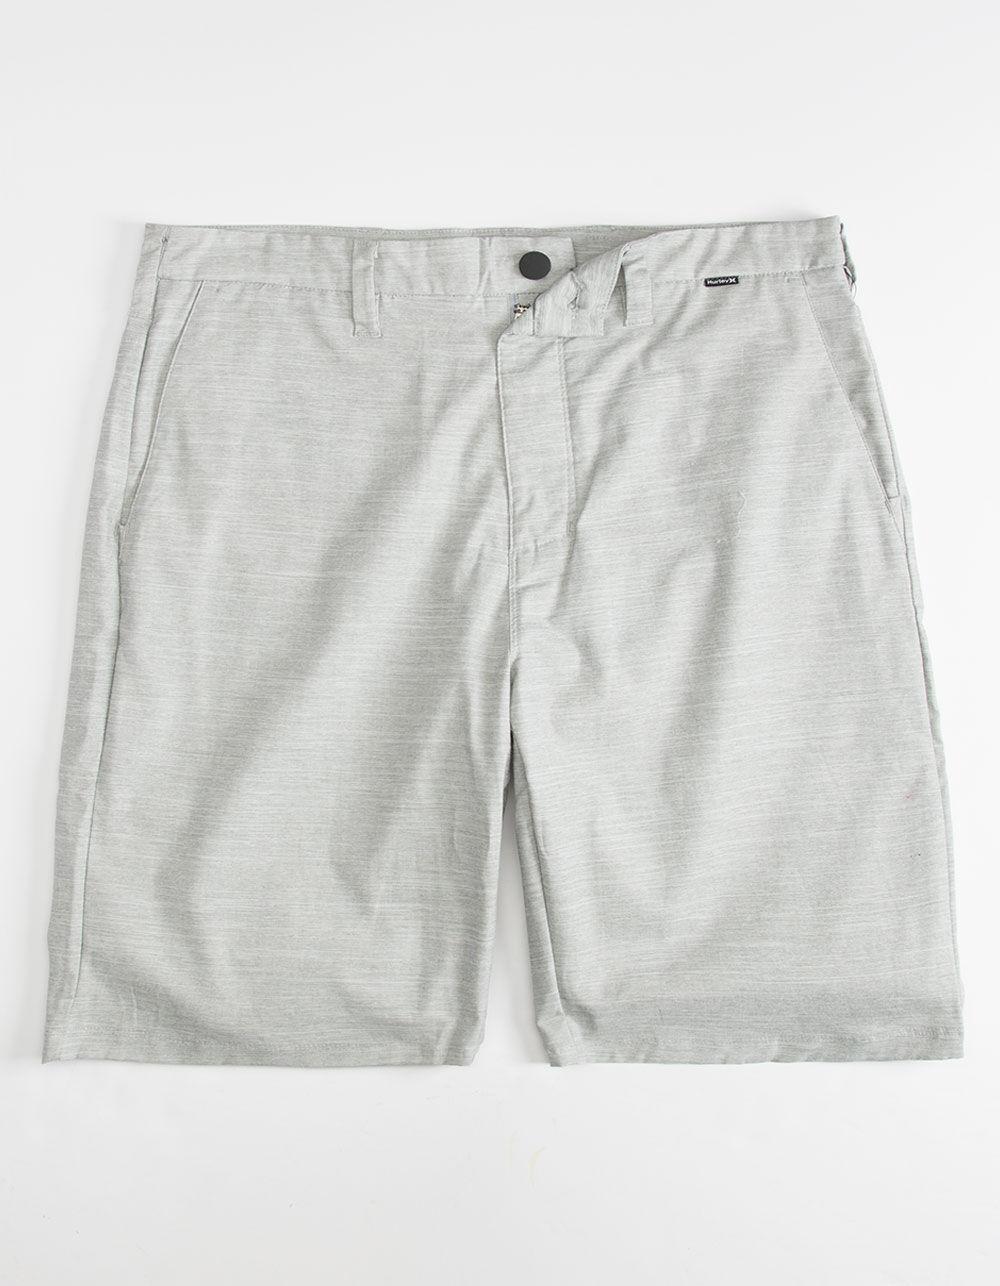 HURLEY Breath Dri-Fit Gray Shorts